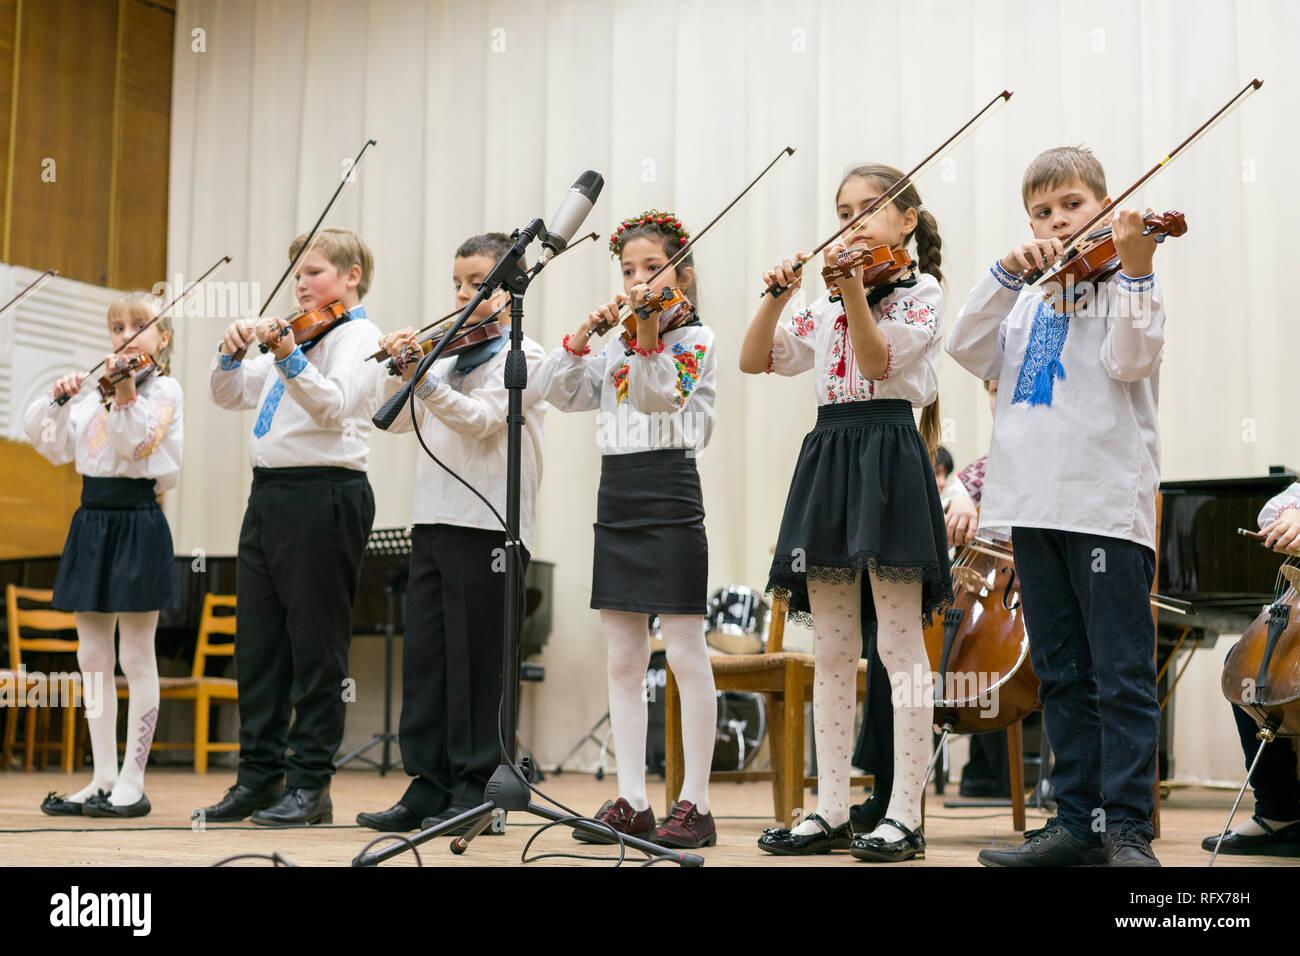 Kiev, Ukraine. January 21 2019 Children's violin ensemble. Children with violins on stage. Children's initiative, small talents. Early child developme - Stock Image